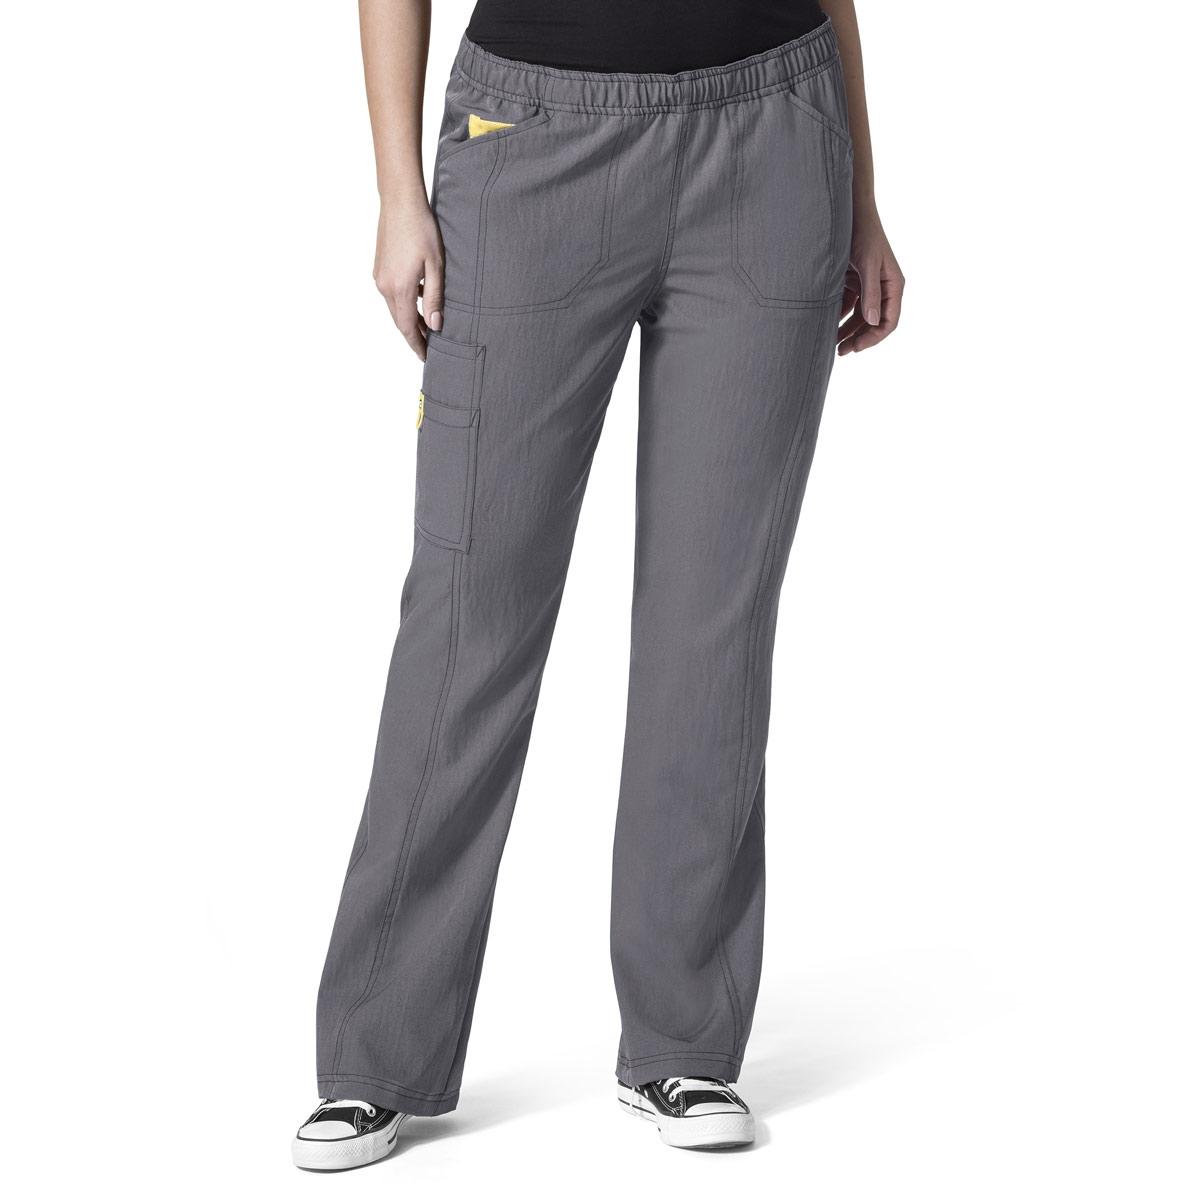 df5b58b58dac8 Plus-Size Boot Cut Cargo Scrub Pants For Women, Sizes Up To 5X - WonderWink  Scrubs